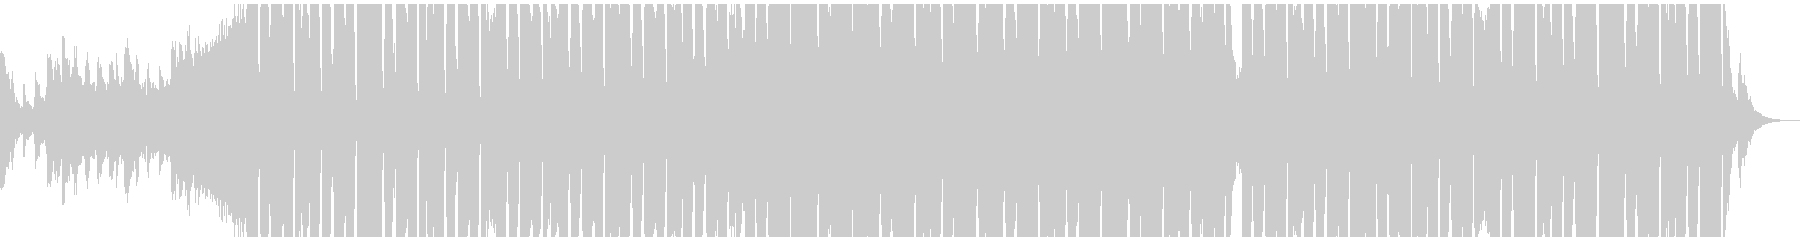 Rock Upbeatの未再生の波形